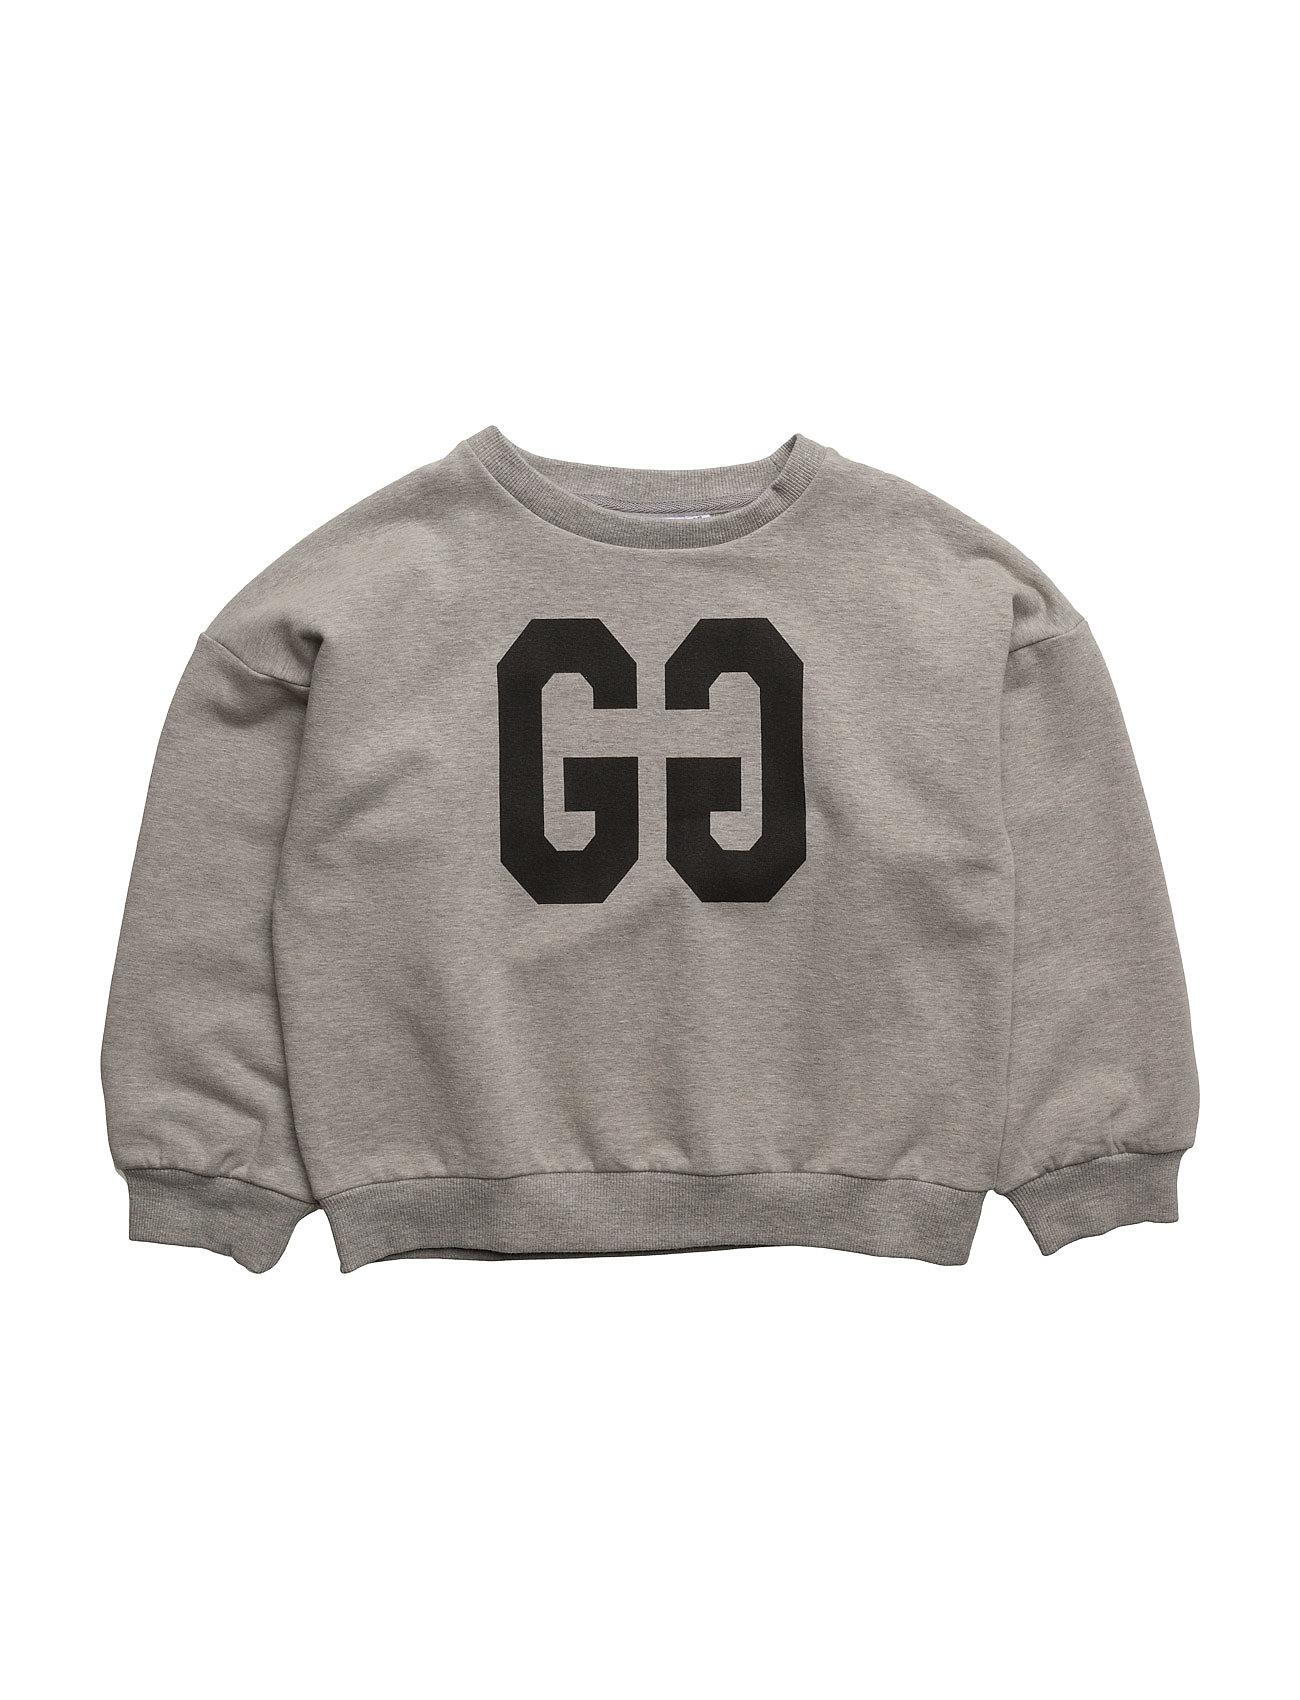 gardner & the gang – The sweat shirt with ballon sleeves gg fra boozt.com dk